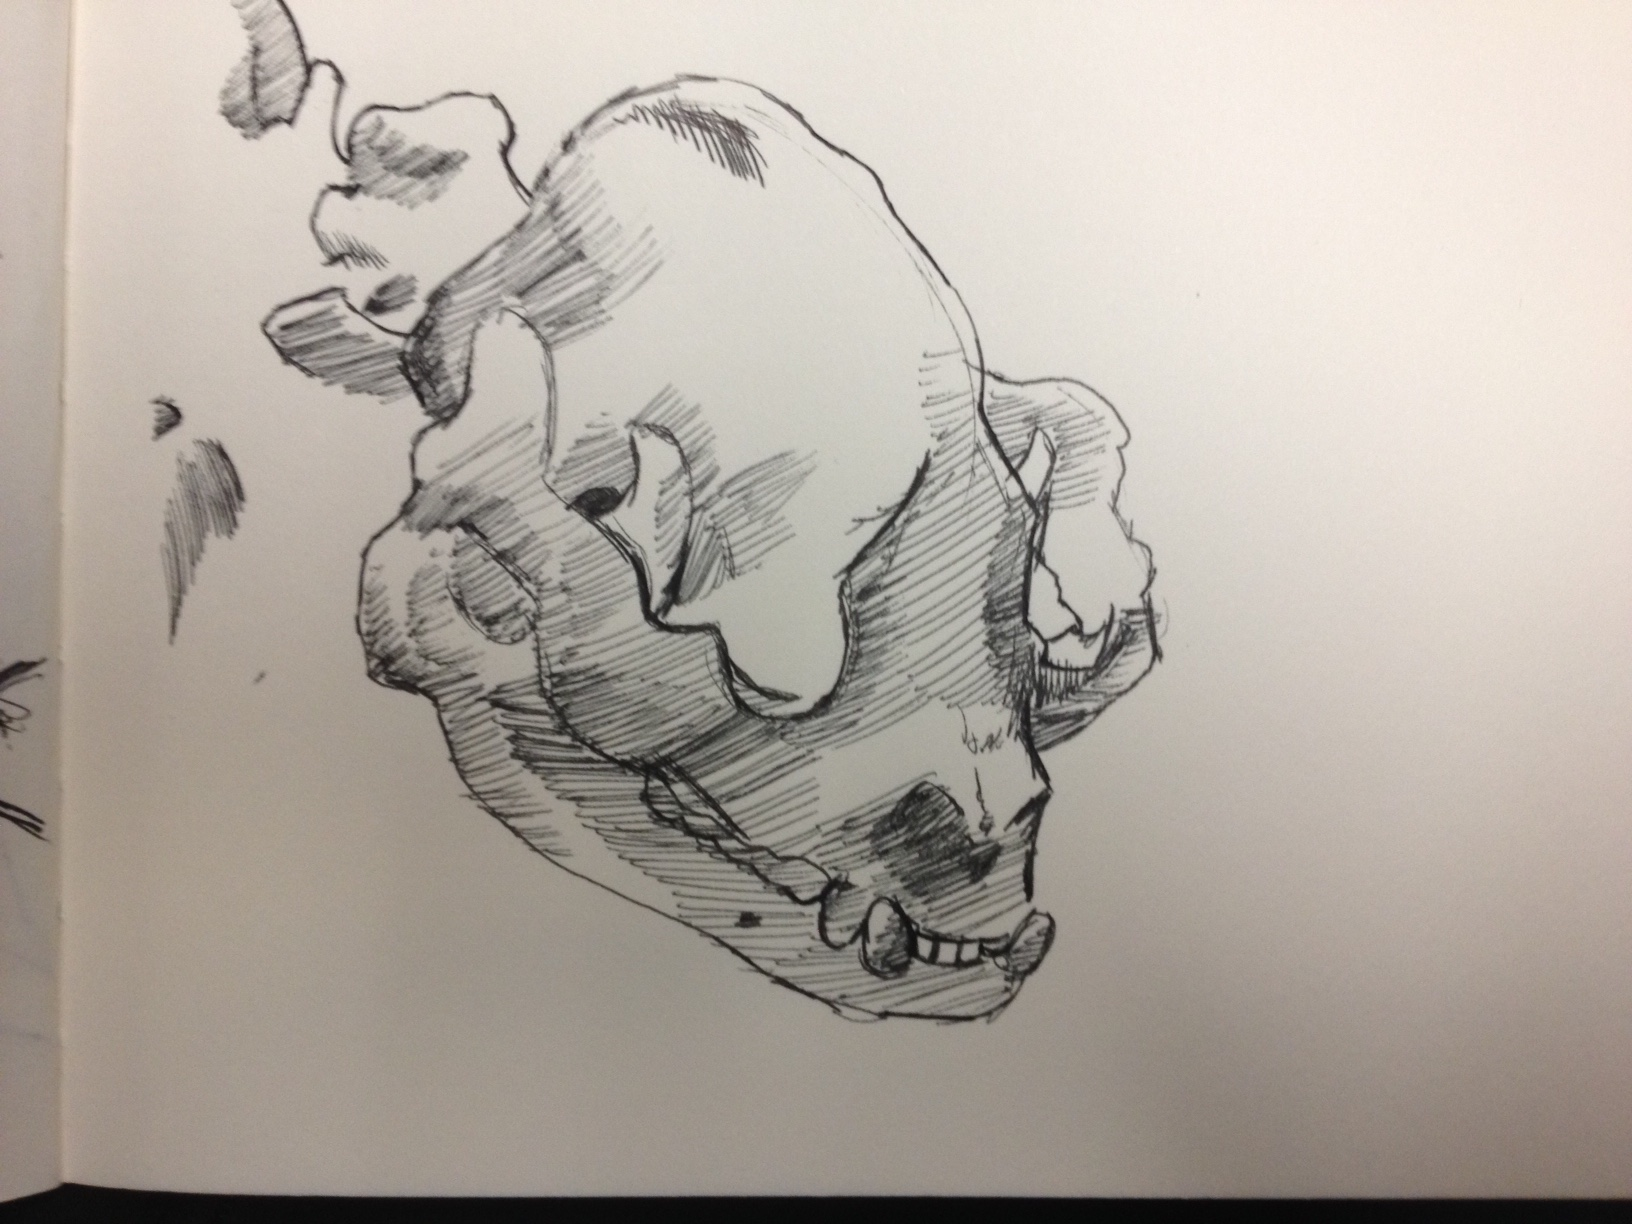 My favorite sketch of the day, Panda Skull.